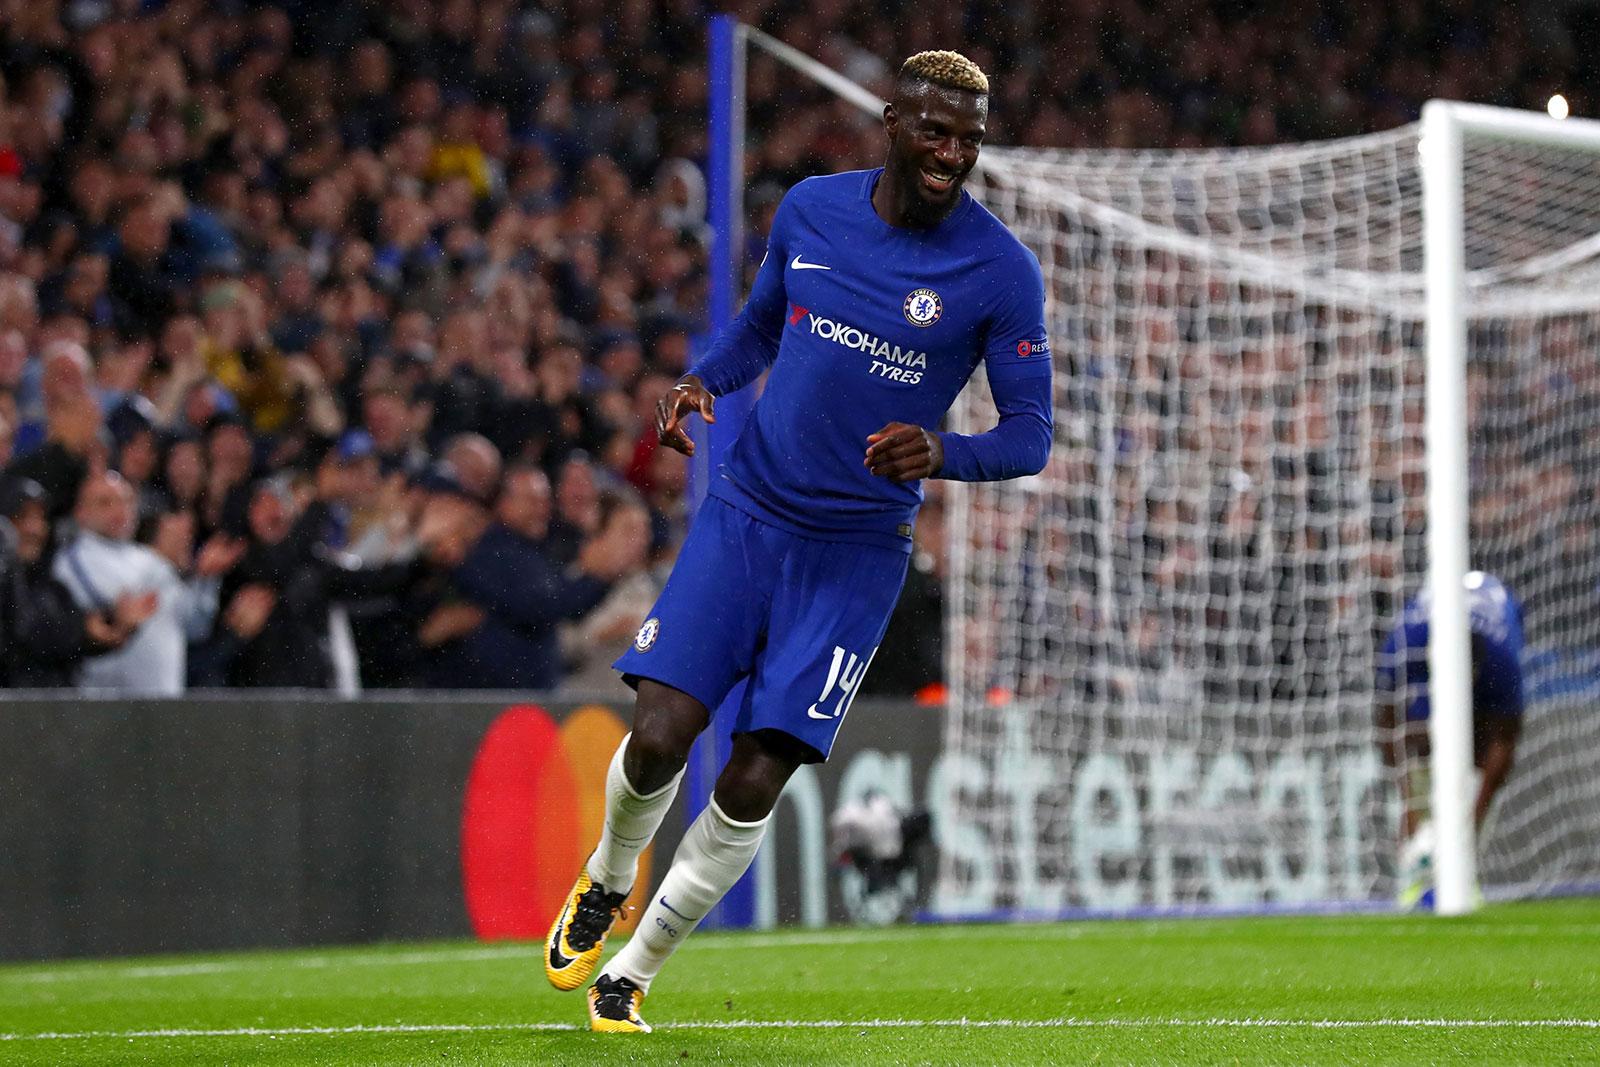 Tiemoue Bakayoko celebrating during Chelsea-Qarabag at Stamford Bridge on September 12, 2017. (Photo by Clive Rose/Getty Images)